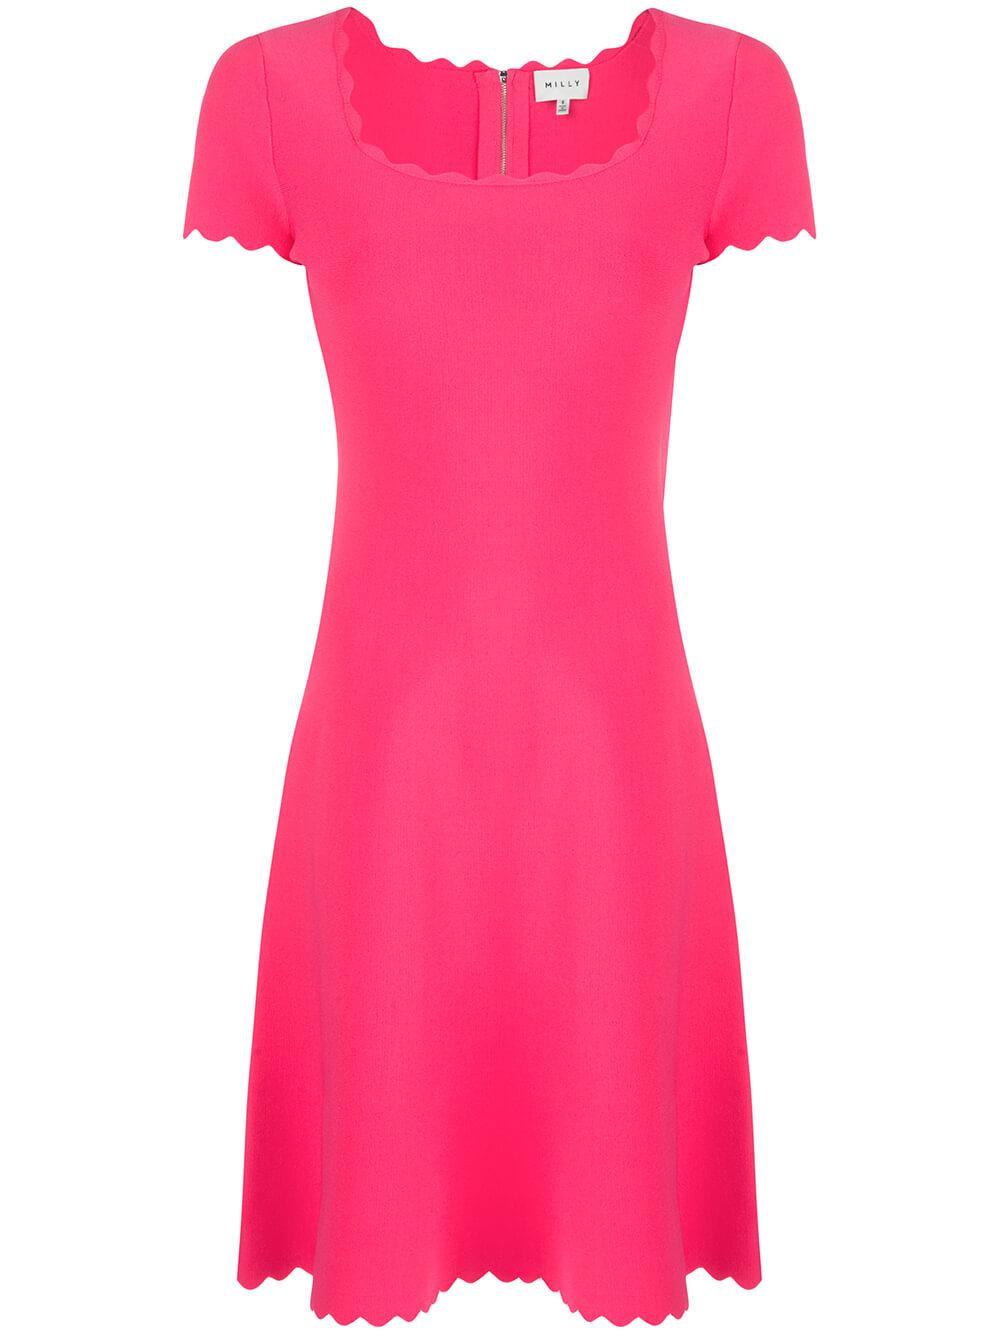 Scallop Square Neck Dress Item # KRD005